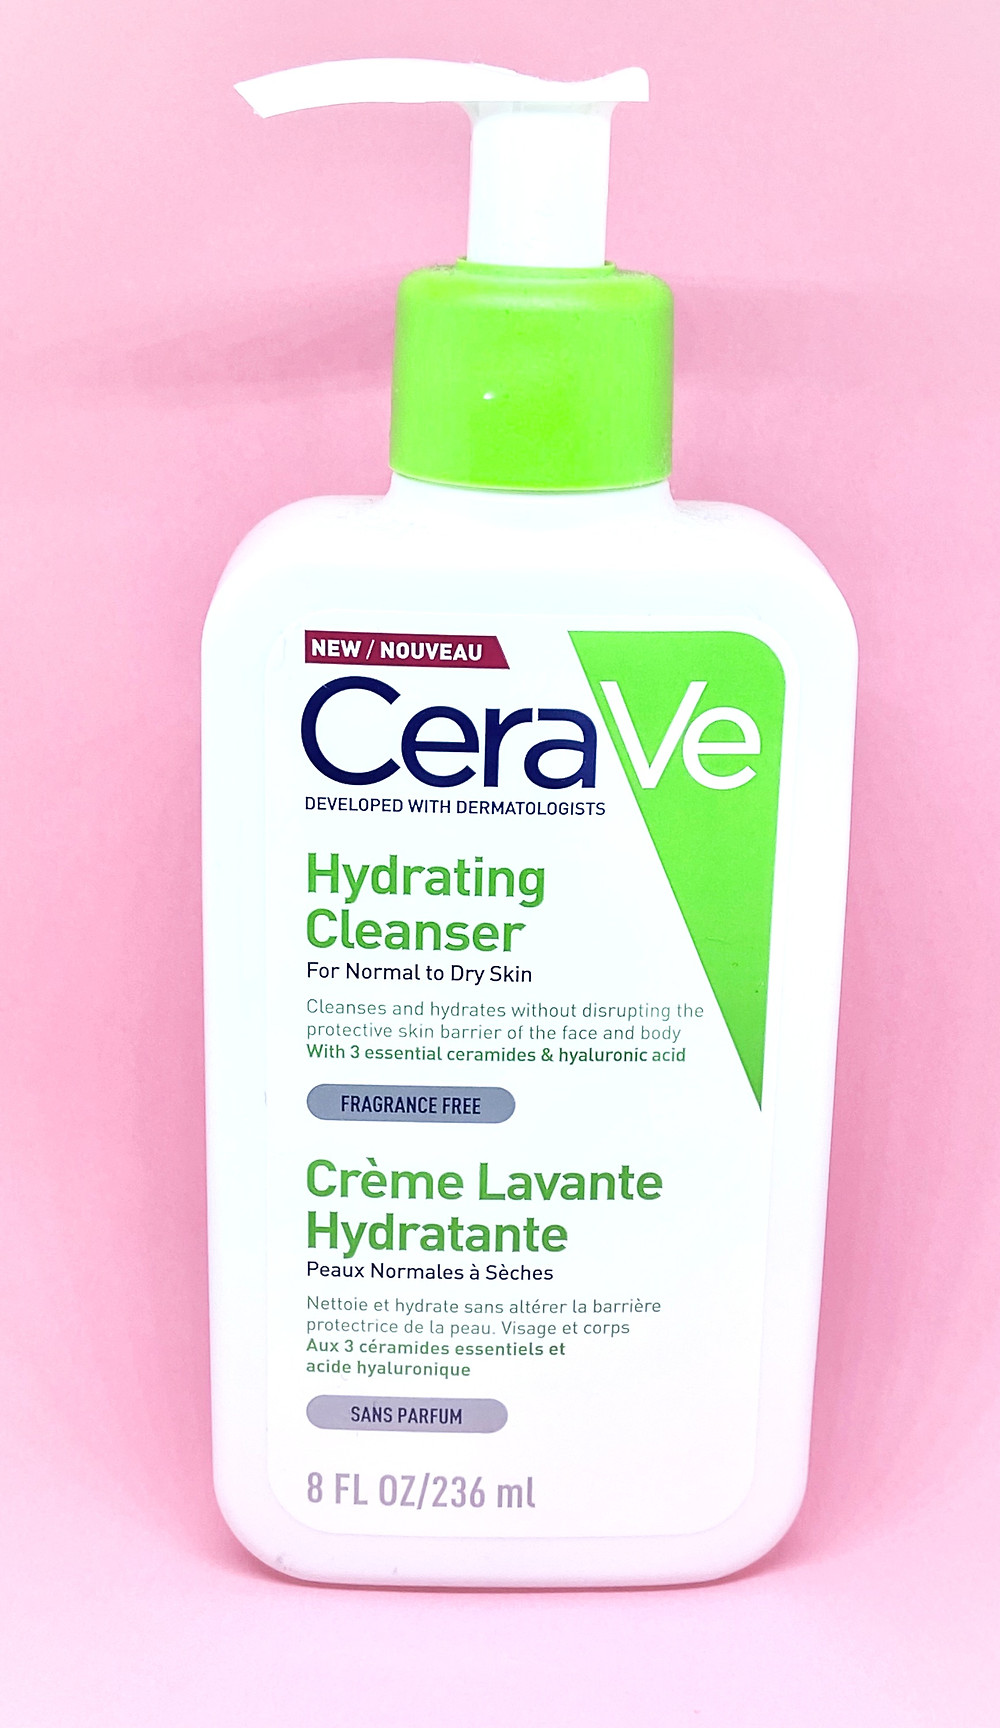 CerVe cleanser bottle on a pink background - BeautifullyOriginal.com